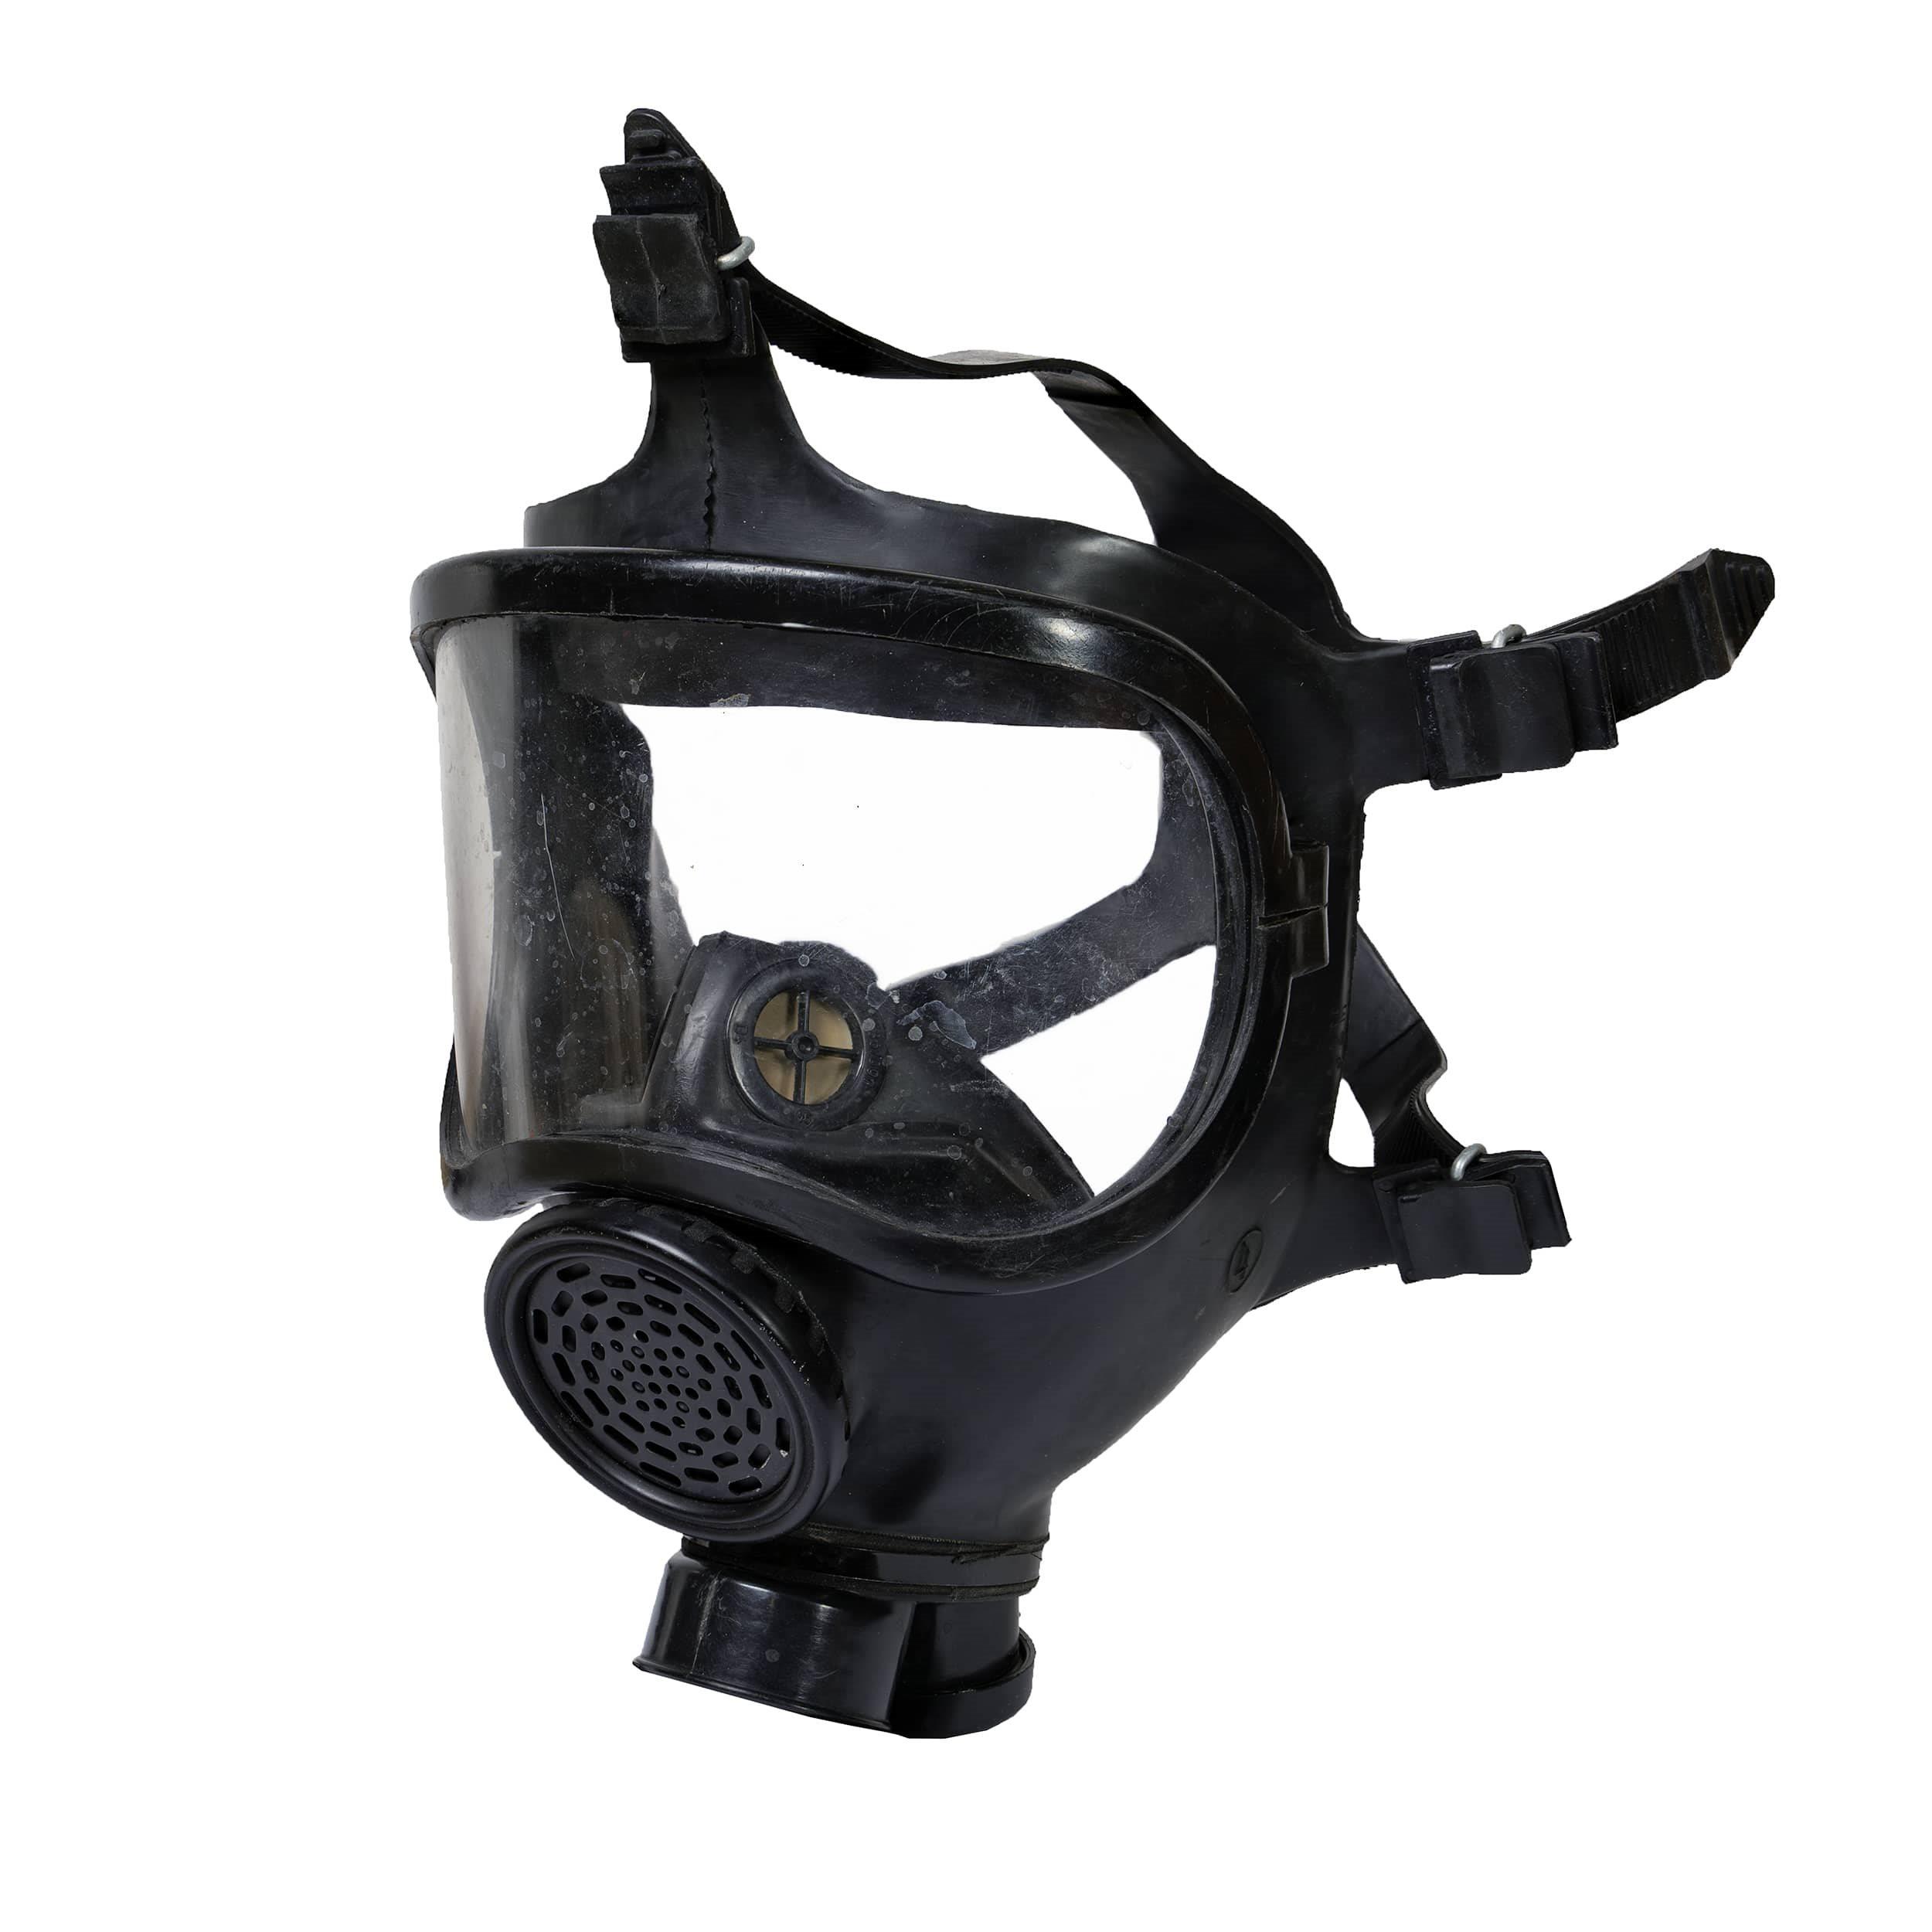 Maska plynová celooblièejová CM-5 použitá